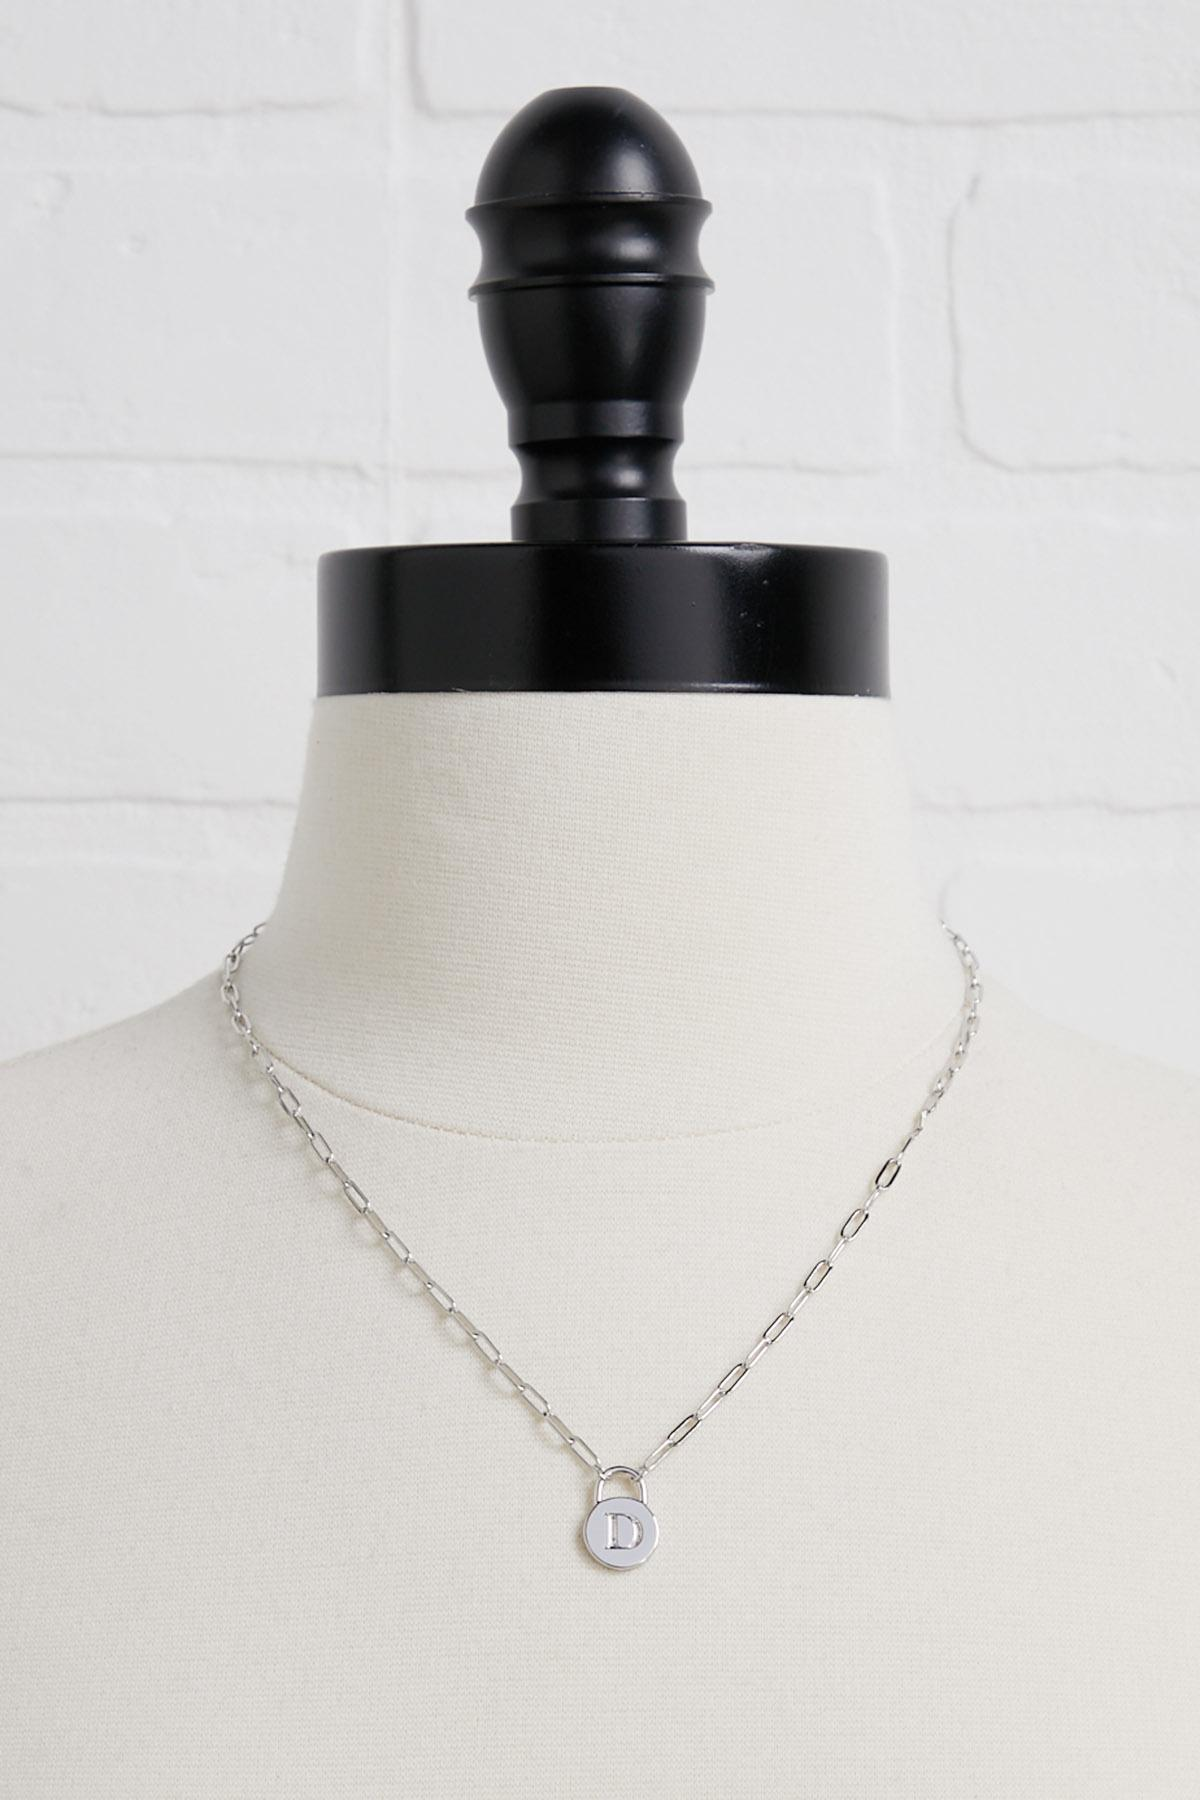 Silver D Necklace